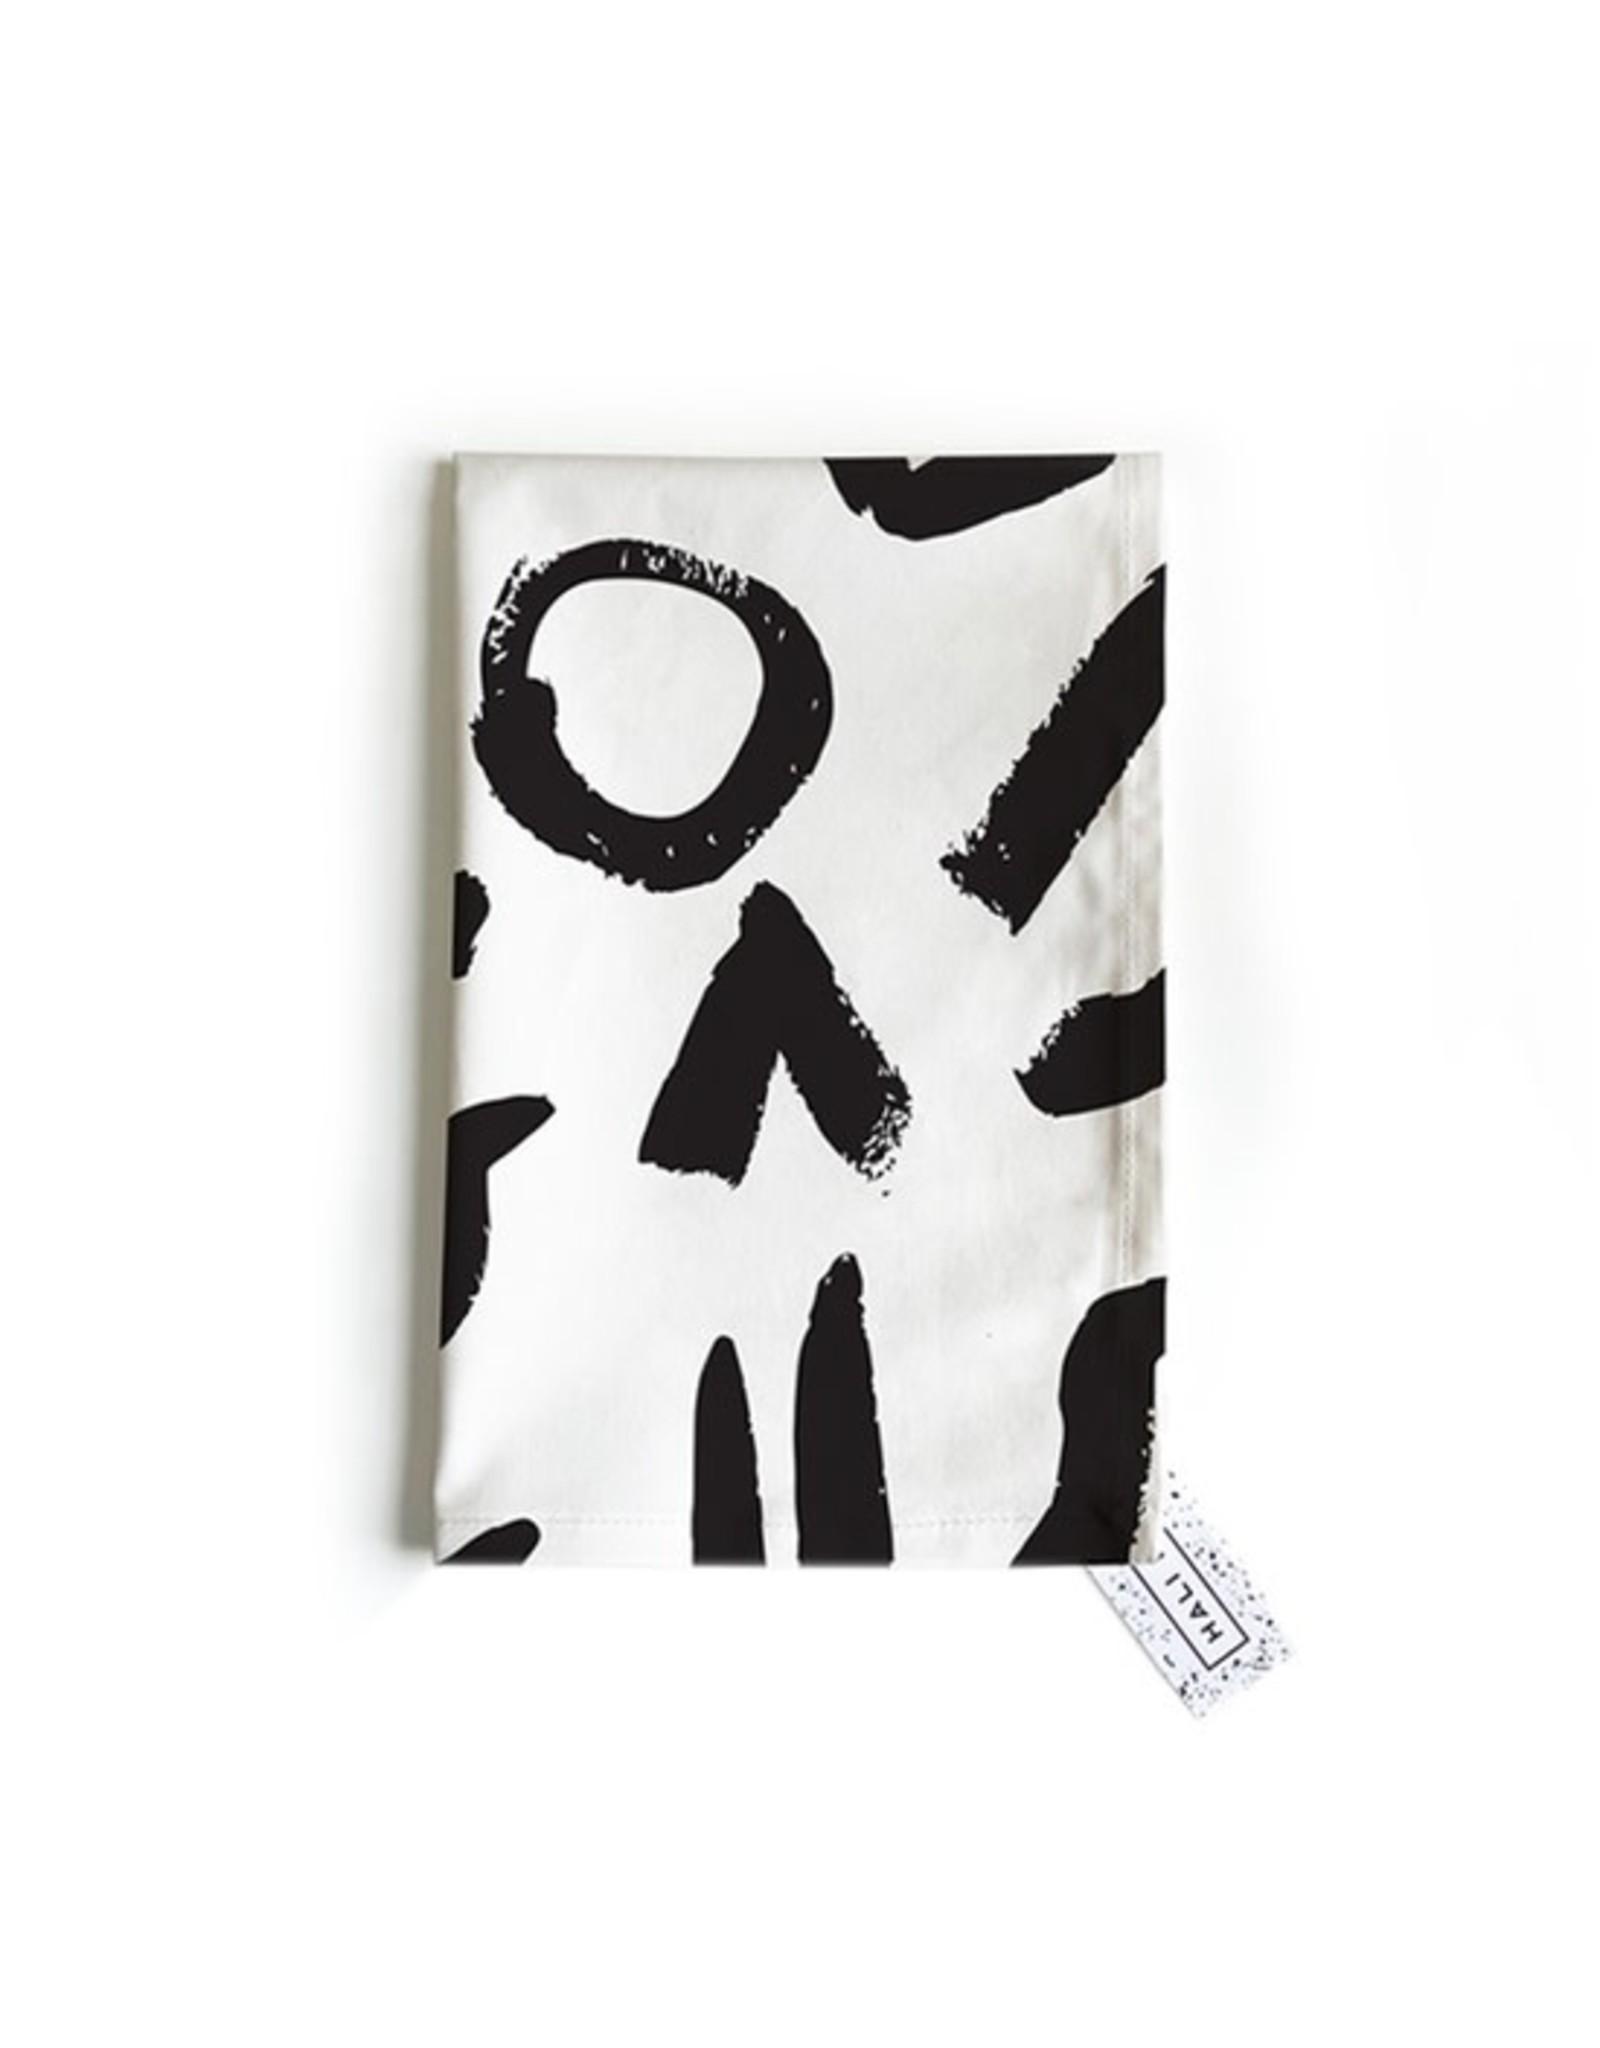 Hali Hali Tea Towel - Express Yourself